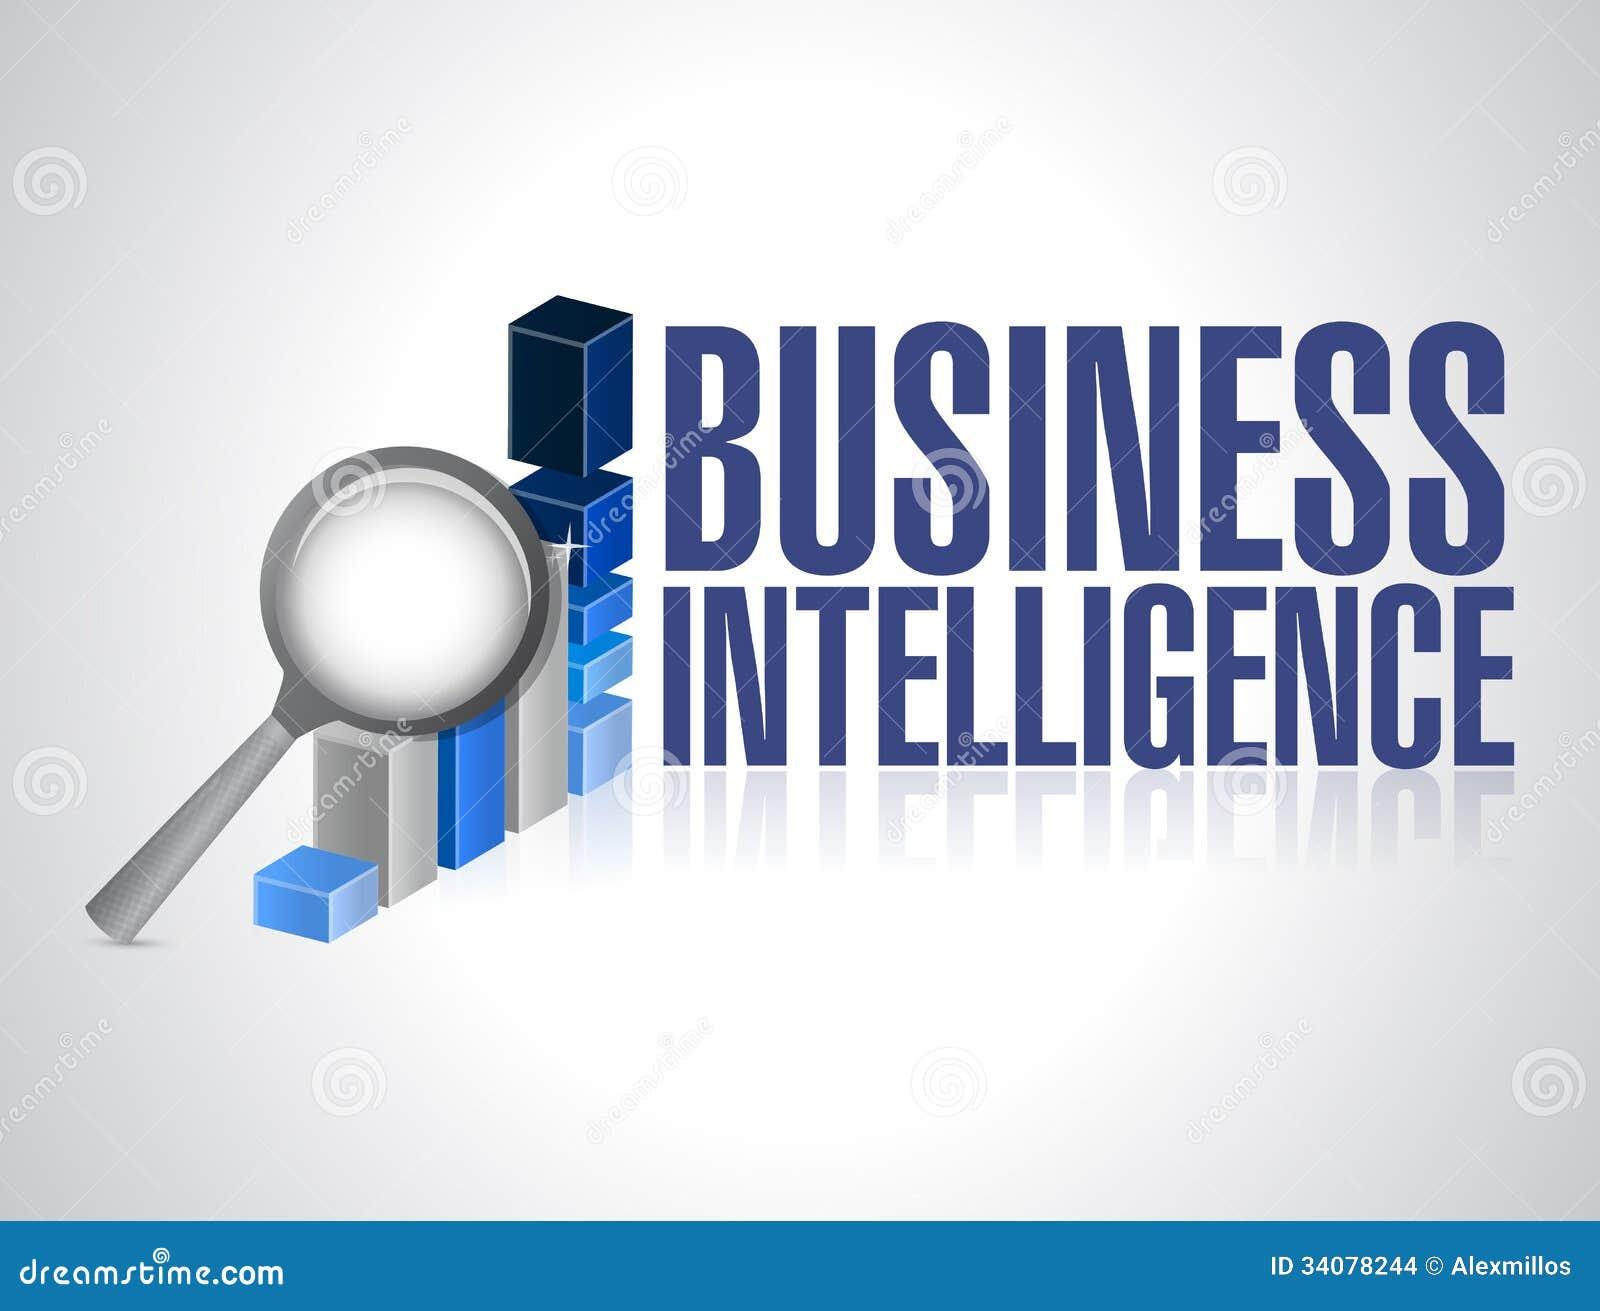 Business intelligence essay